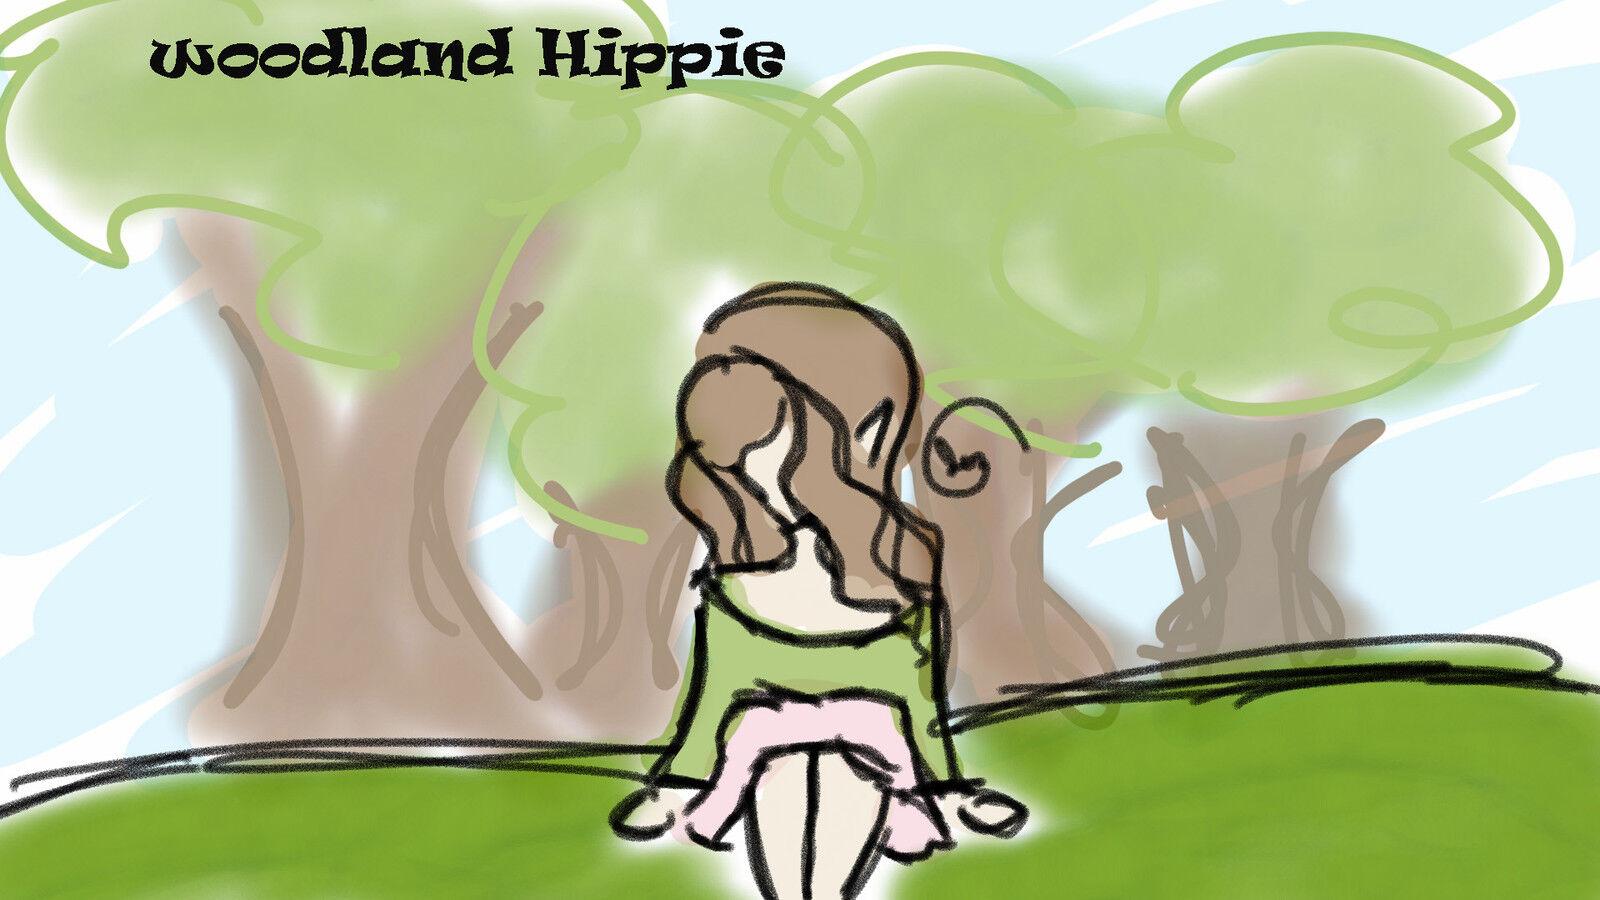 Woodland Hippie Mercantile